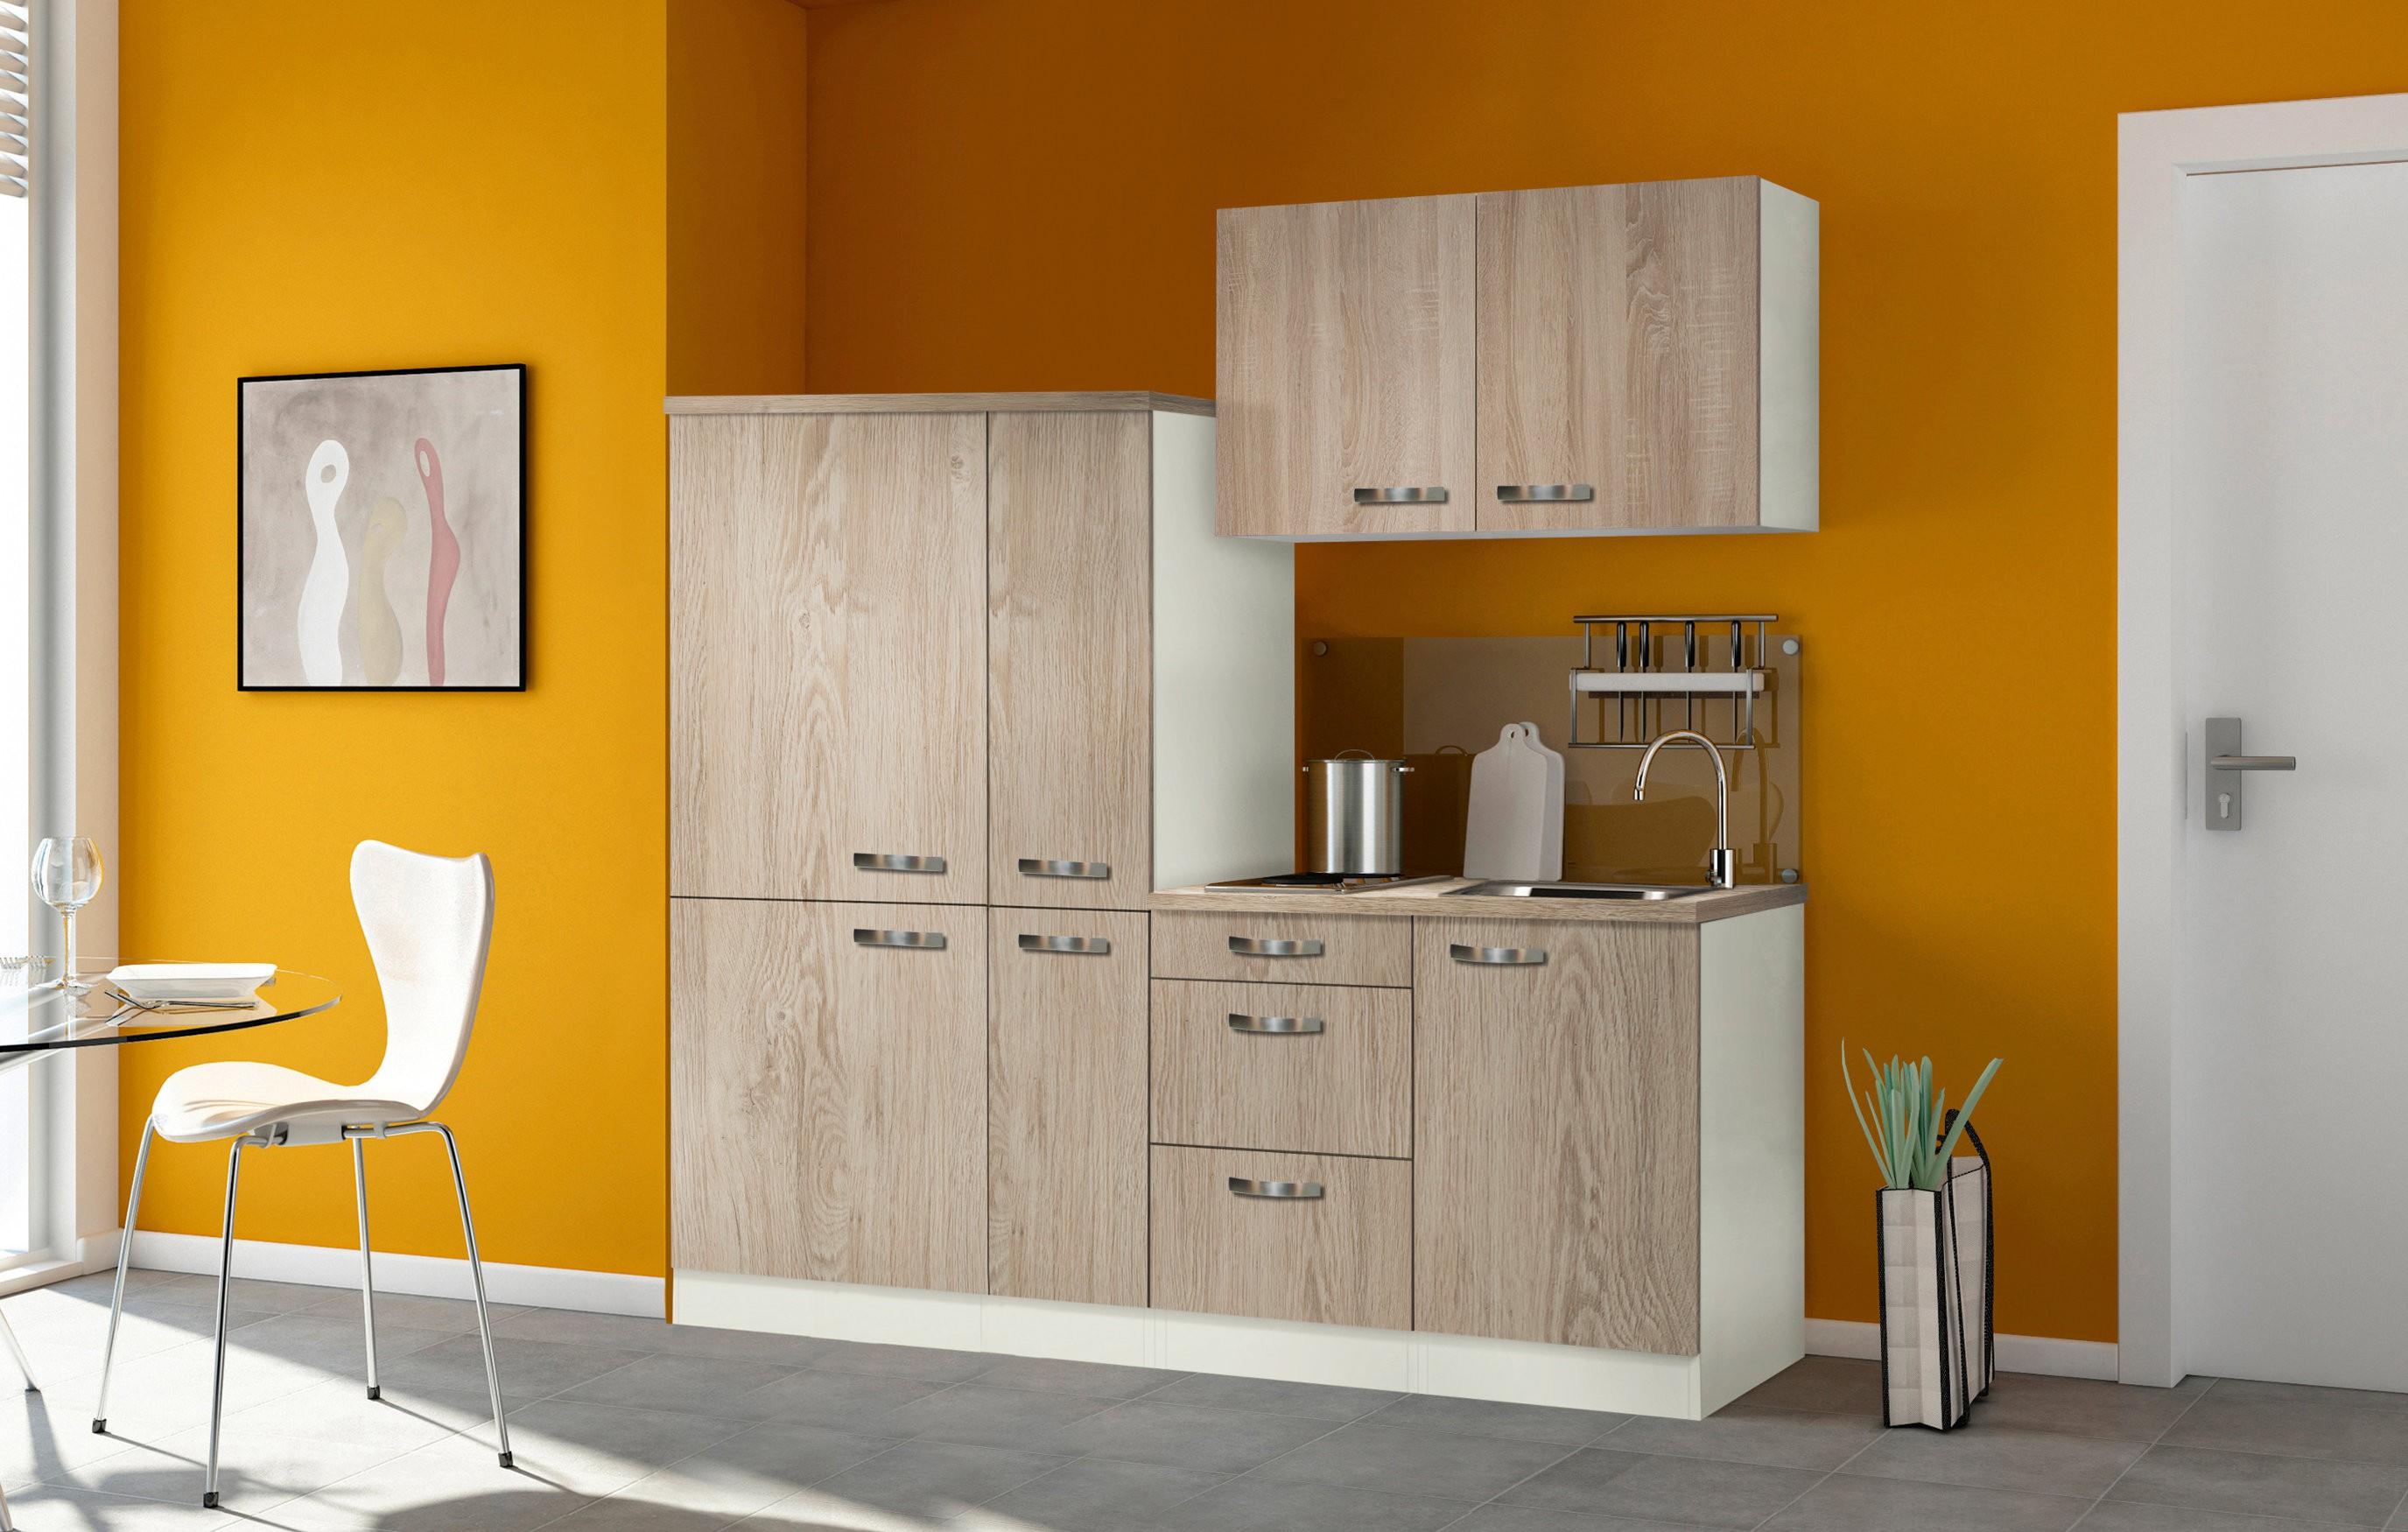 singlek che toledo mit elektro kochfeld breite 190 cm eiche s gerau k che singlek chen. Black Bedroom Furniture Sets. Home Design Ideas